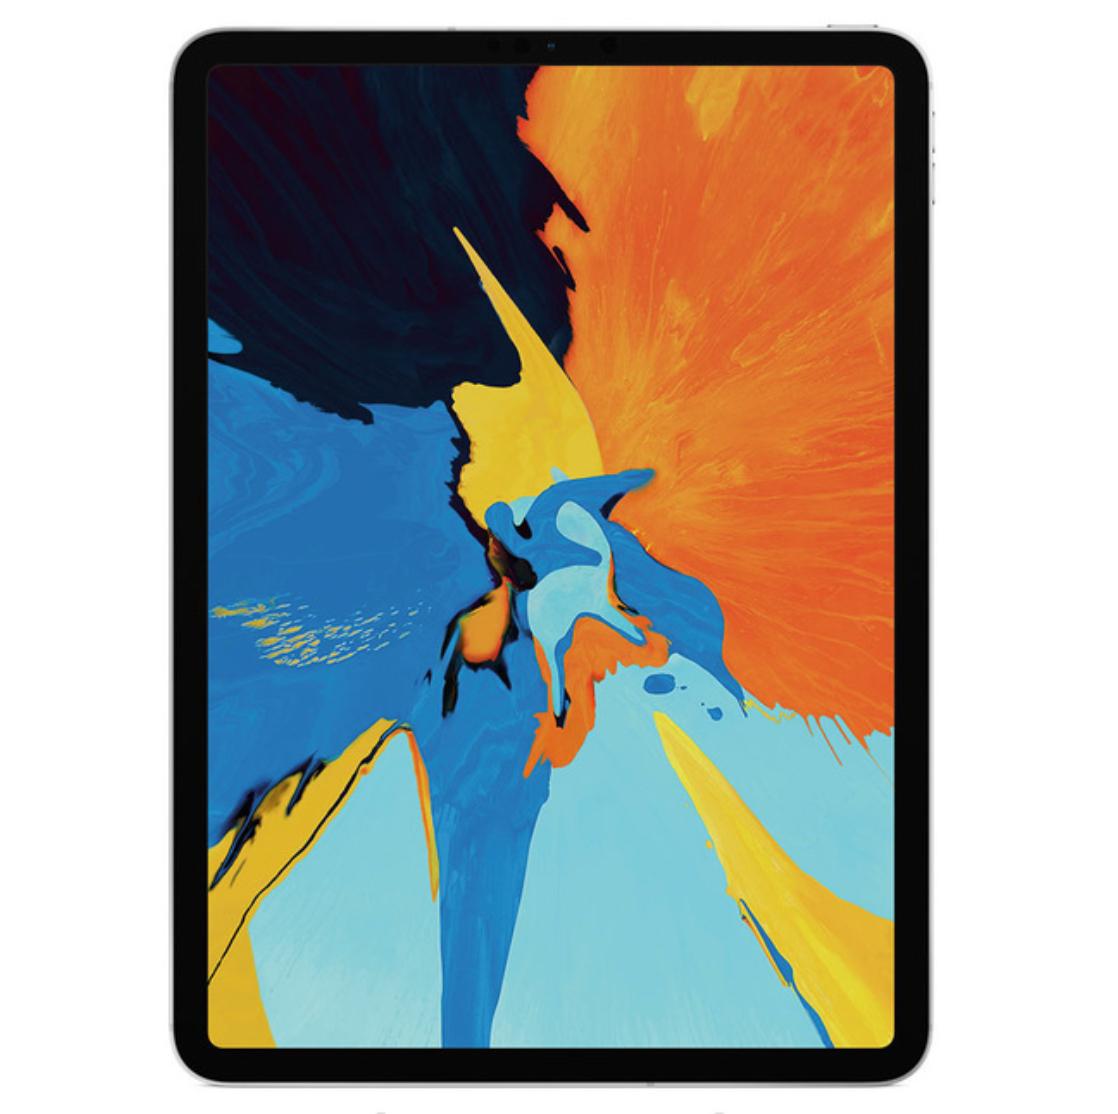 Apple iPad Pro 11 inch 2020 128Gb Wi-Fi silver - £719.98 @ Costco member price